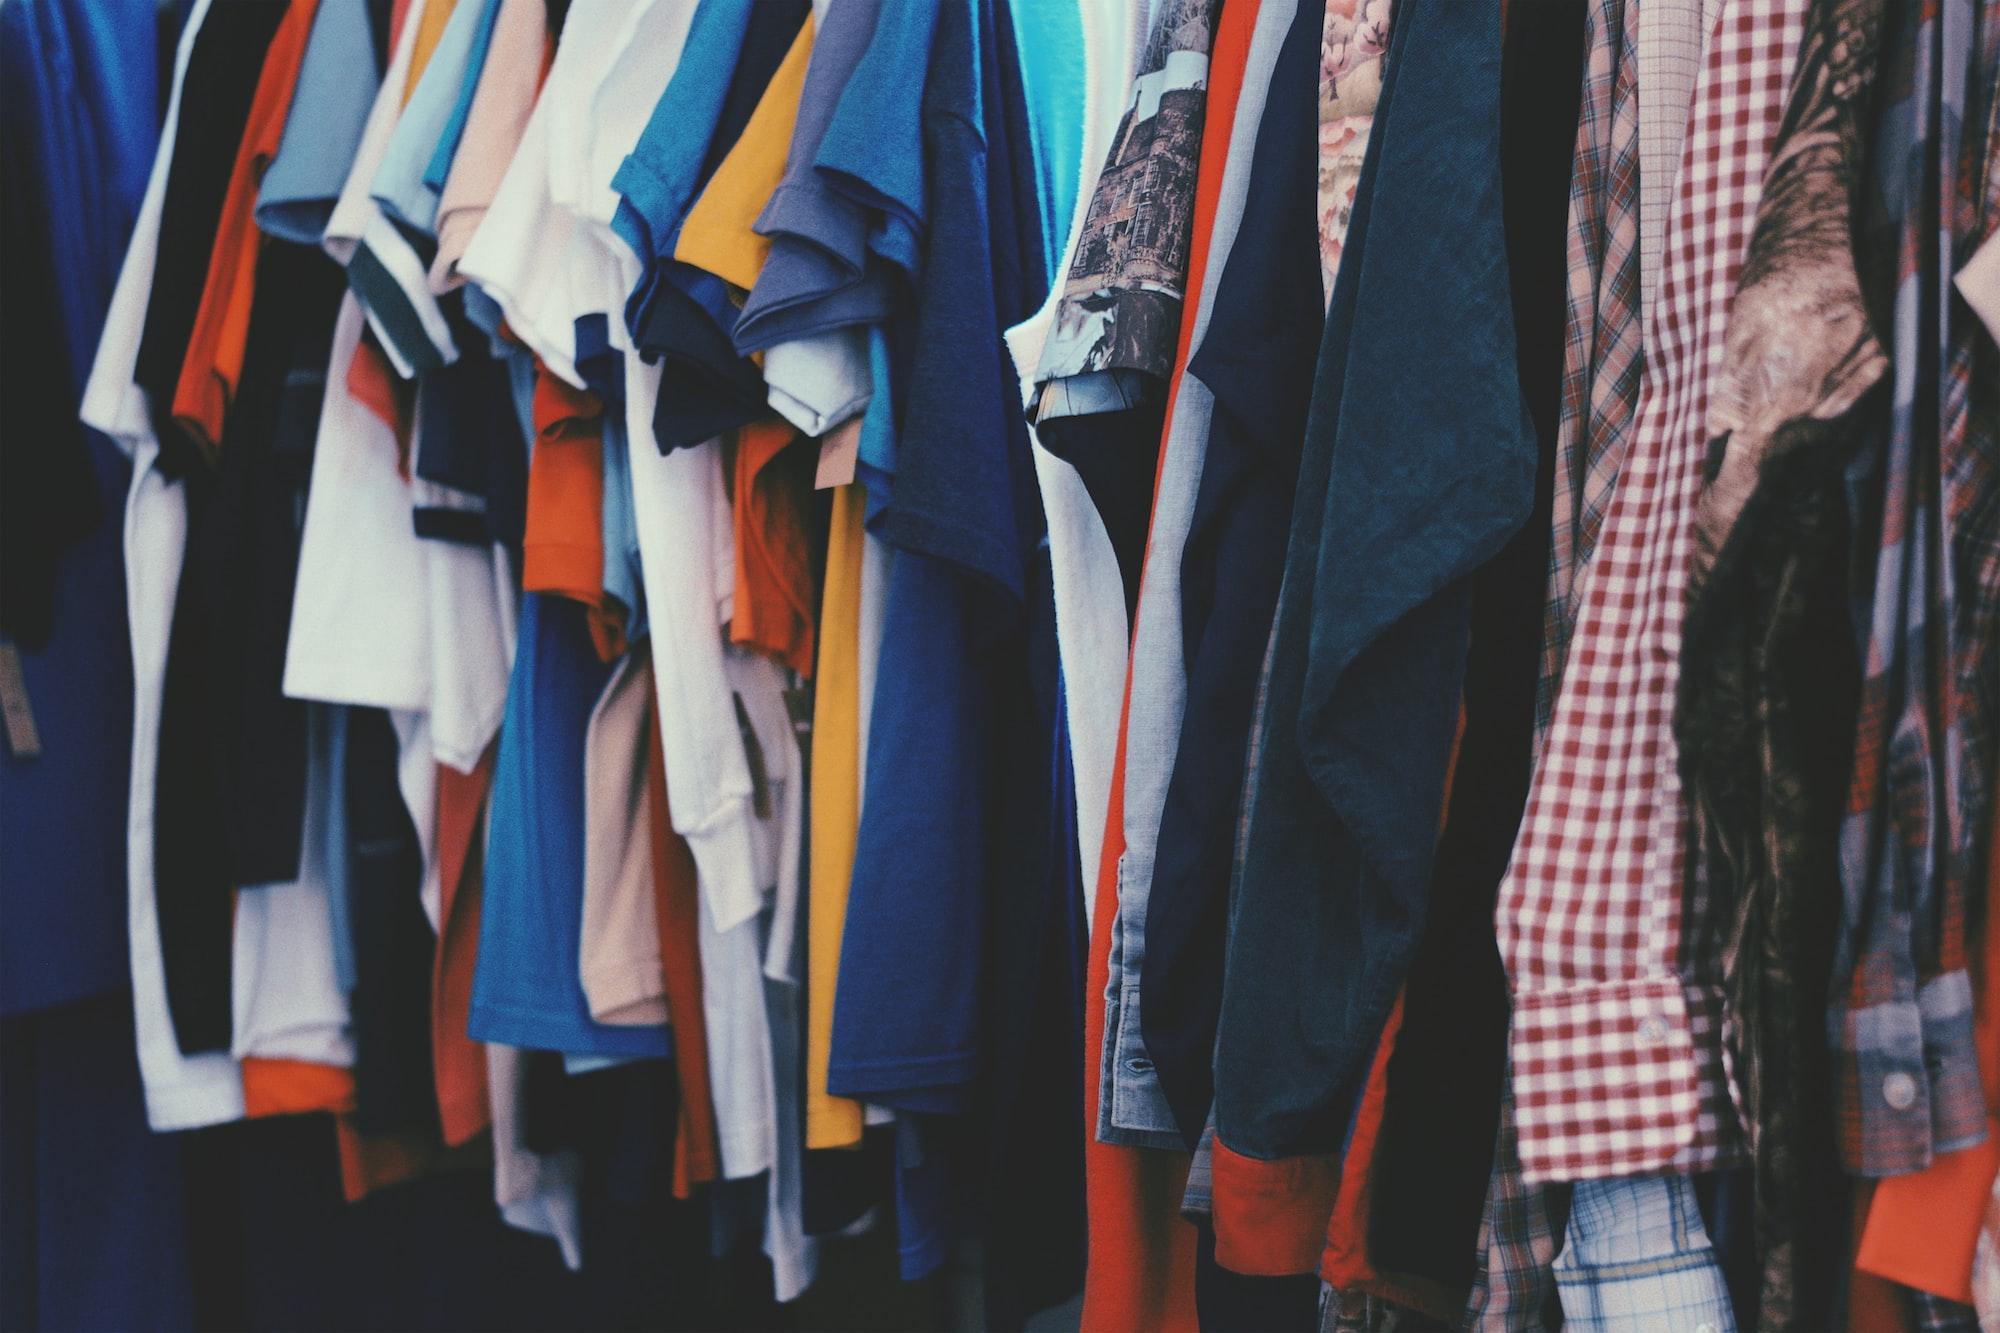 Shipping clothes on Depop vs Poshmark